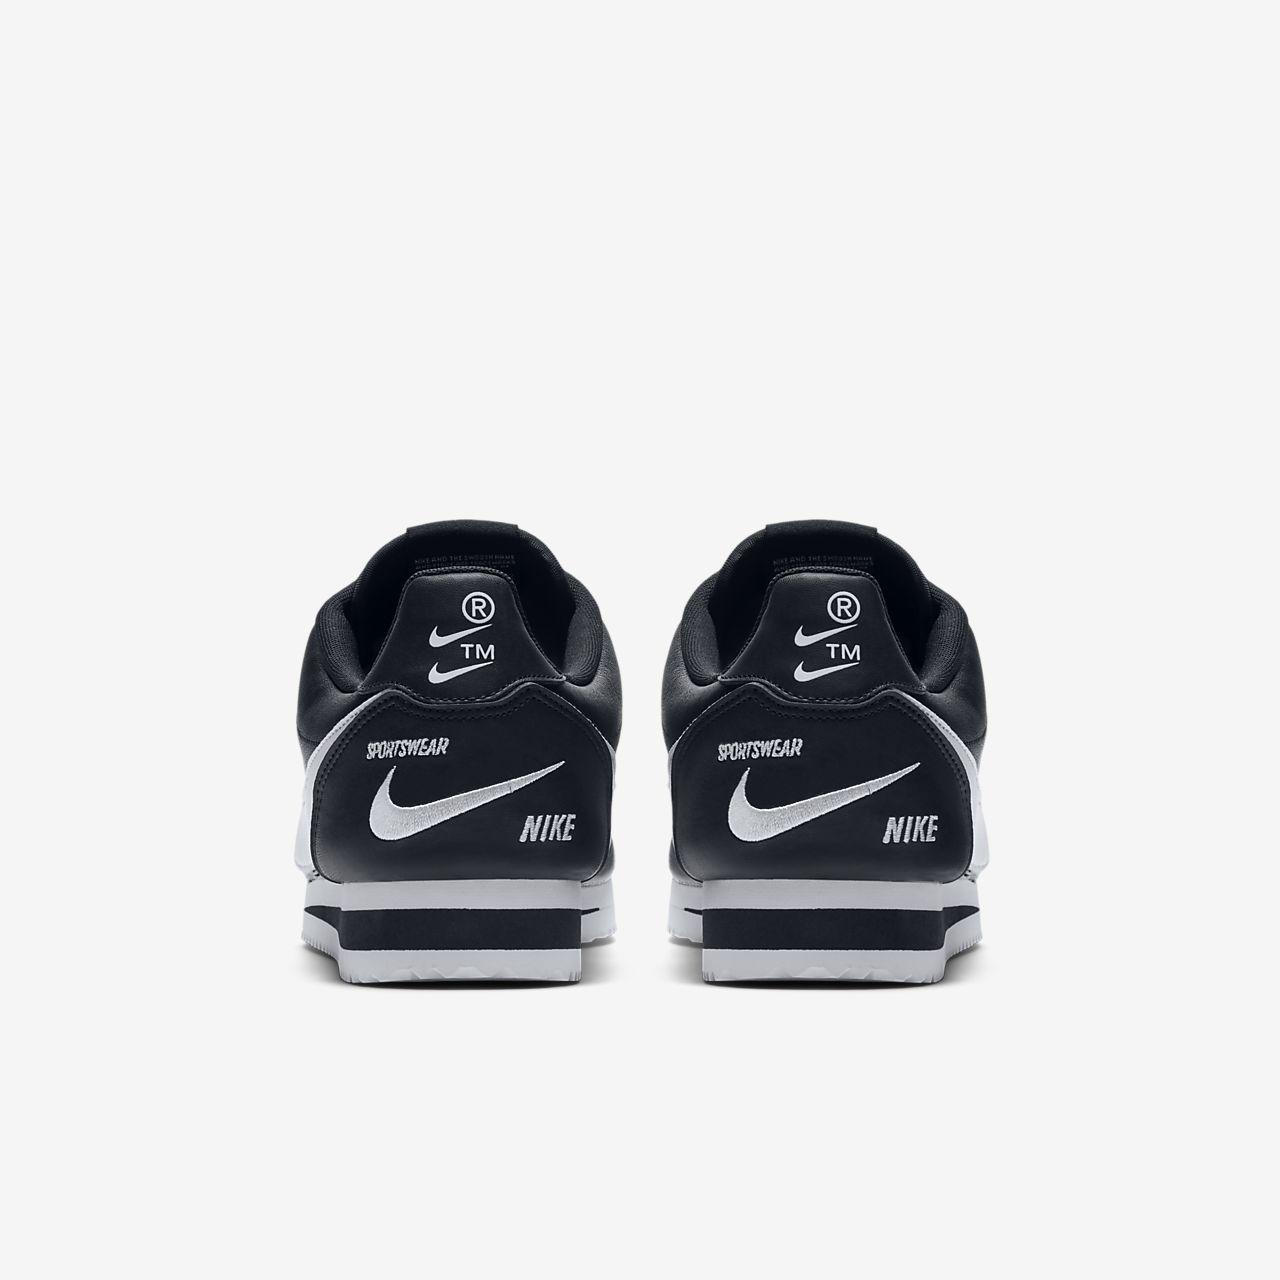 innovative design 7e7b4 85787 ... Nike Classic Cortez Premium Unisex Shoe